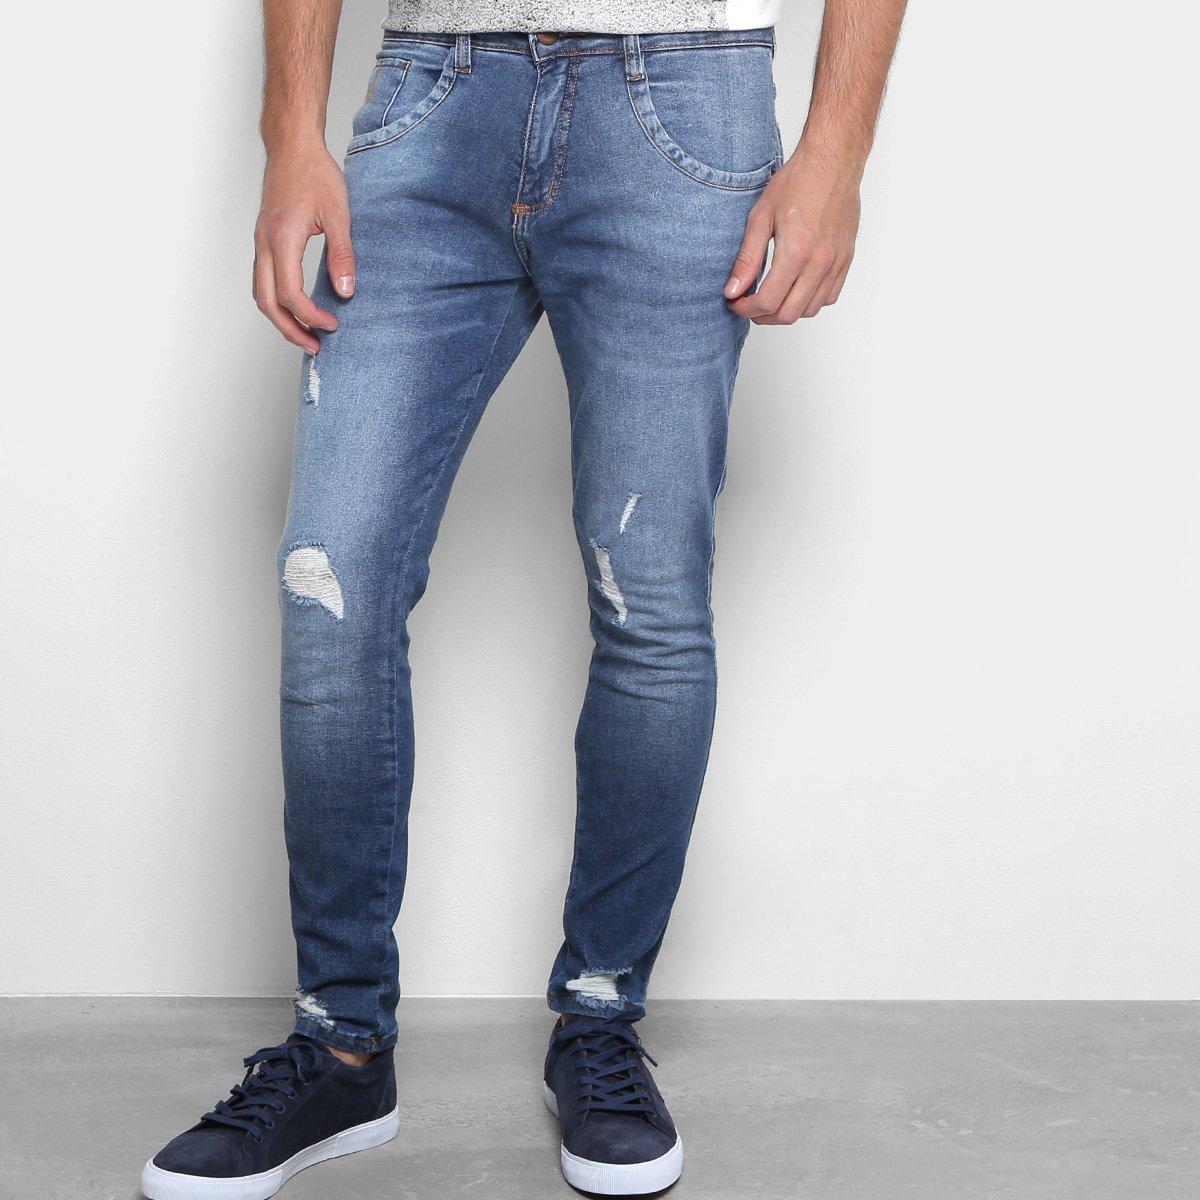 b0359a571f Calça Jeans Skinny Biotipo Rasgos Masculina